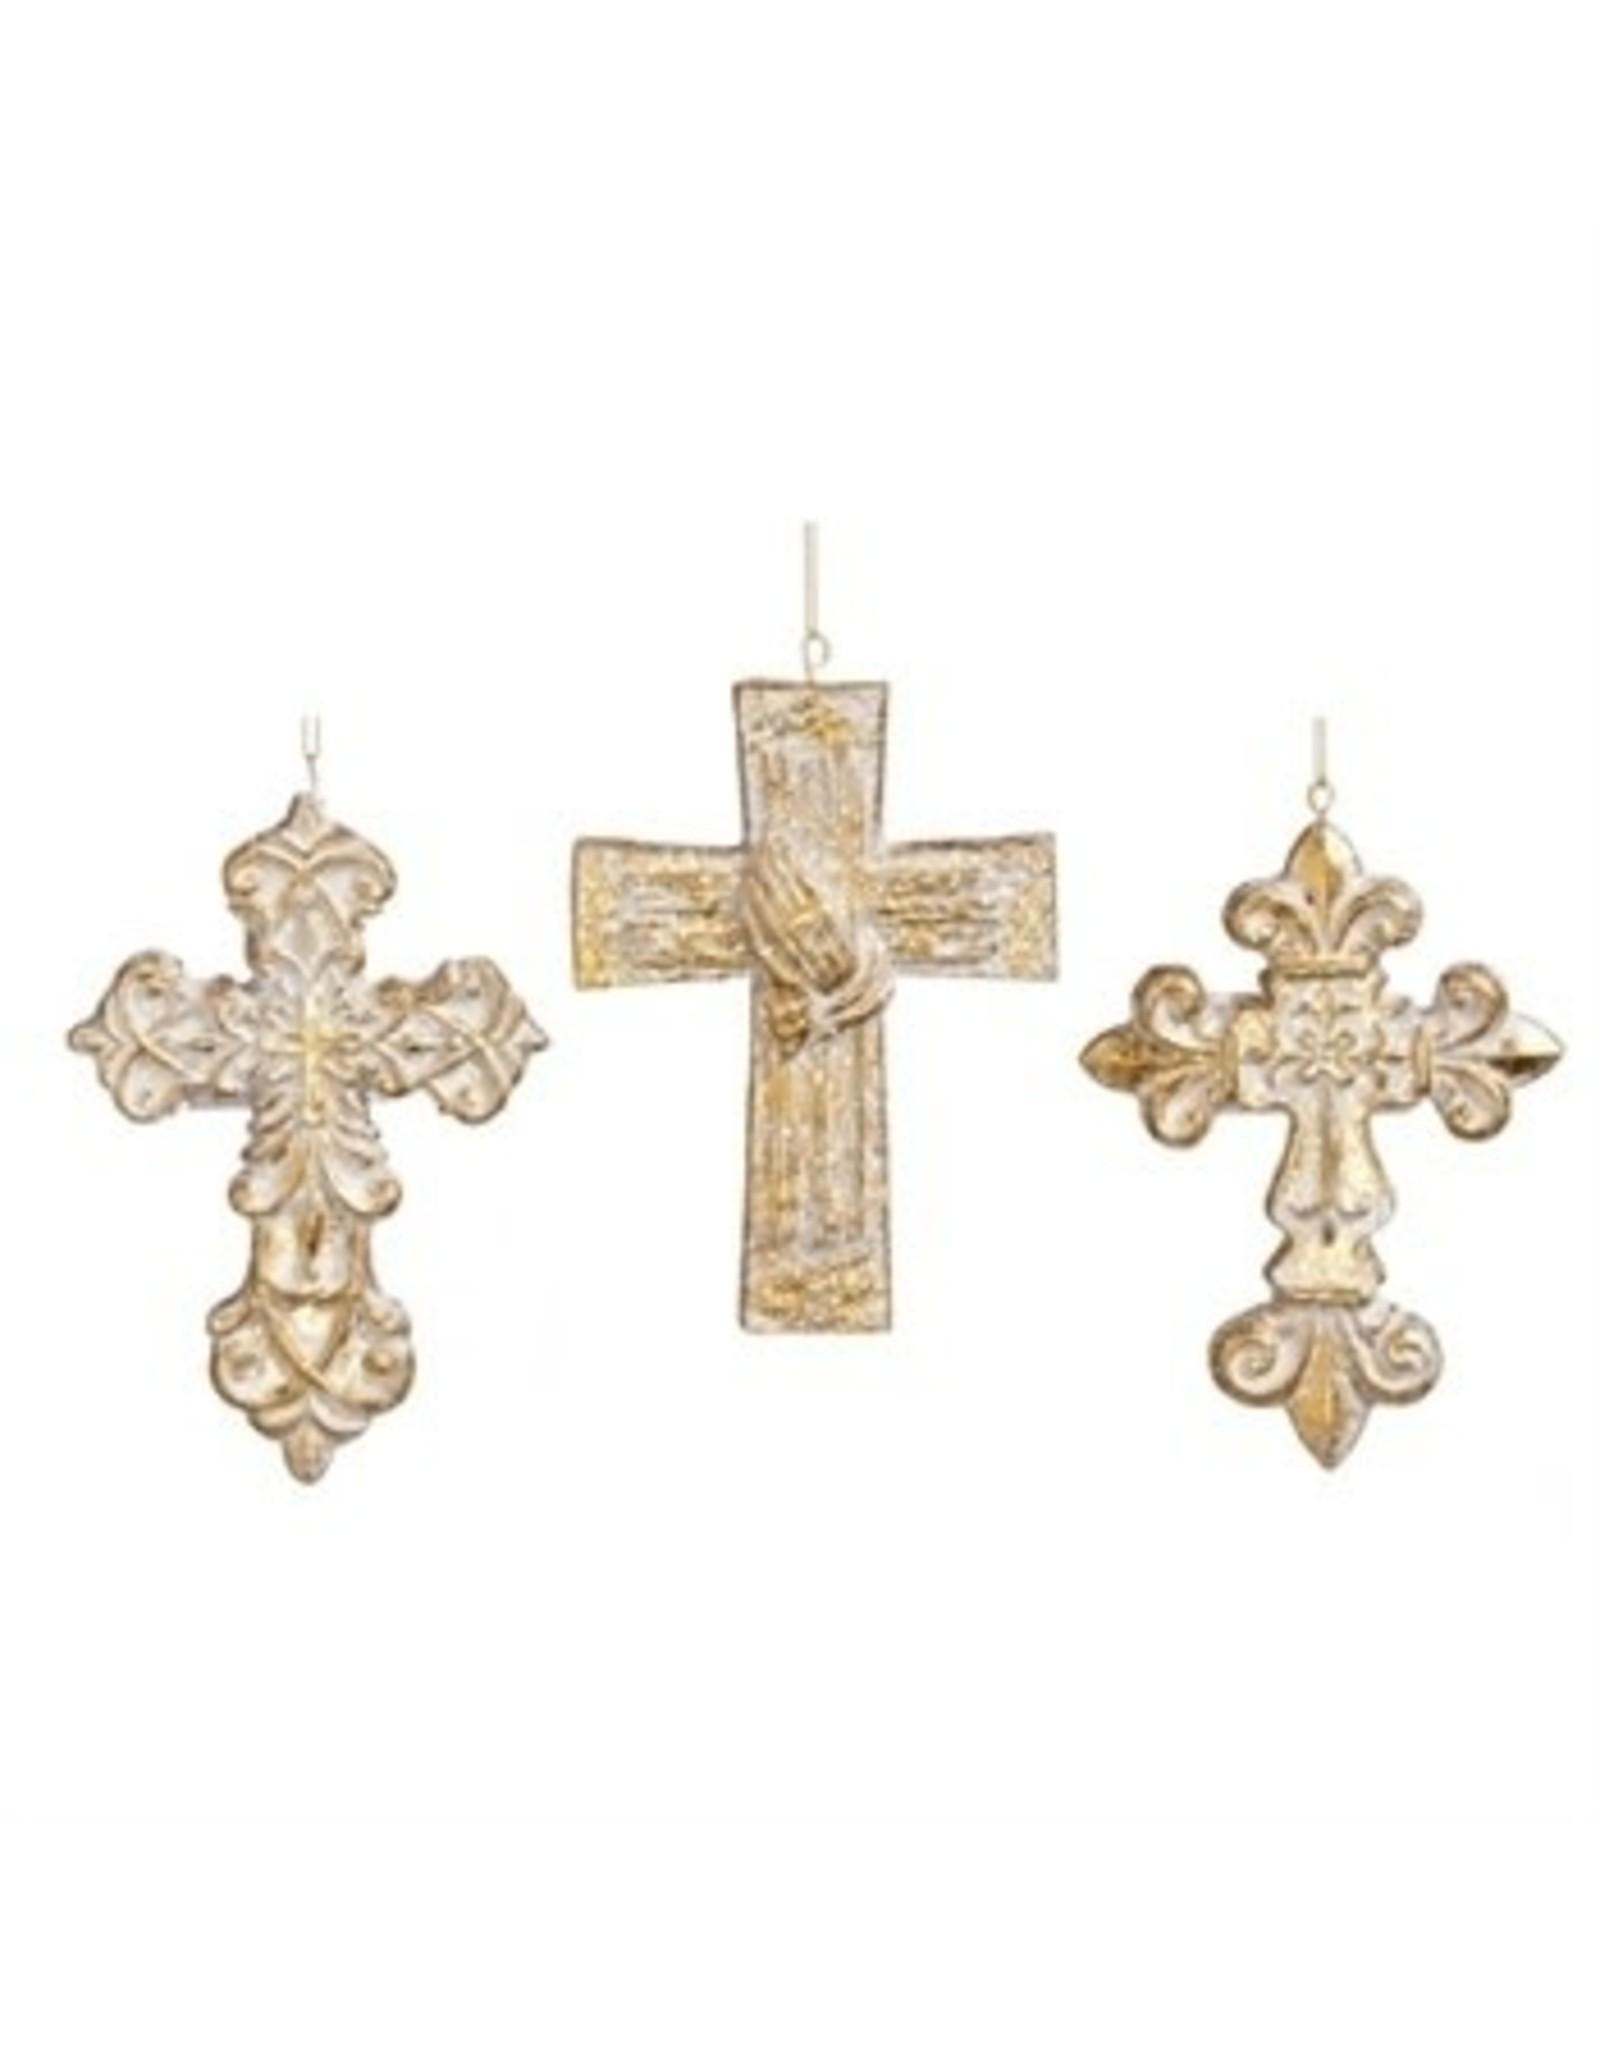 Evergreen Enterprises Gold Polystone Cross Ornament-Flourish Cross